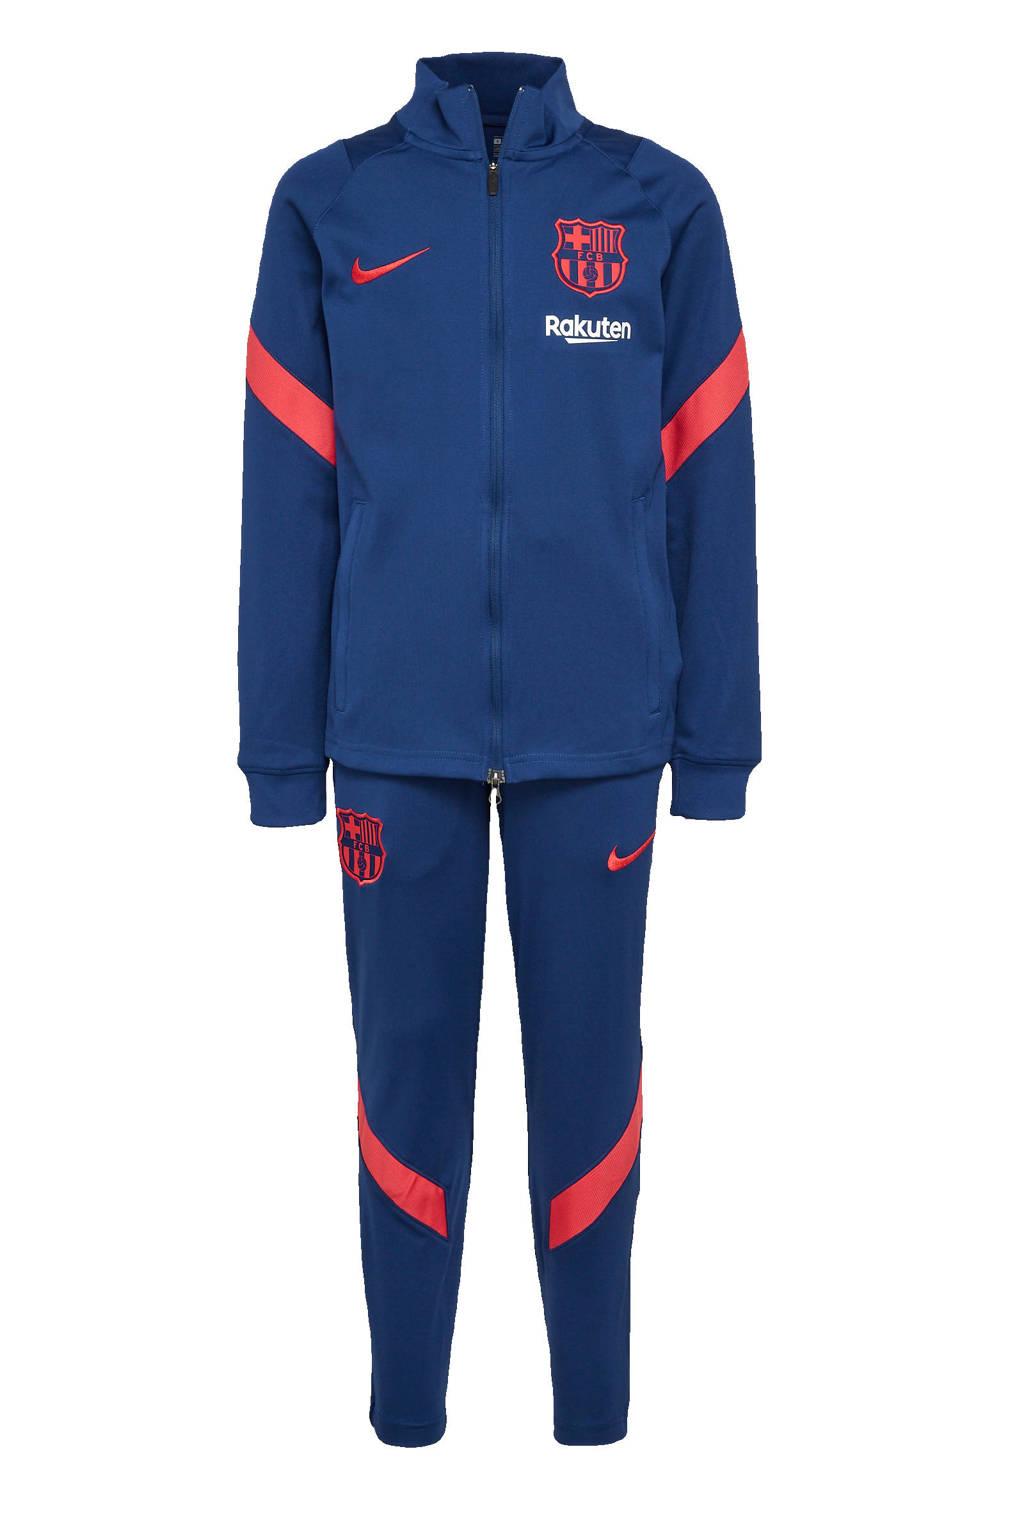 Nike Junior FC Barcelona trainingspak kobaltblauw/rood, Kobaltblauw/rood